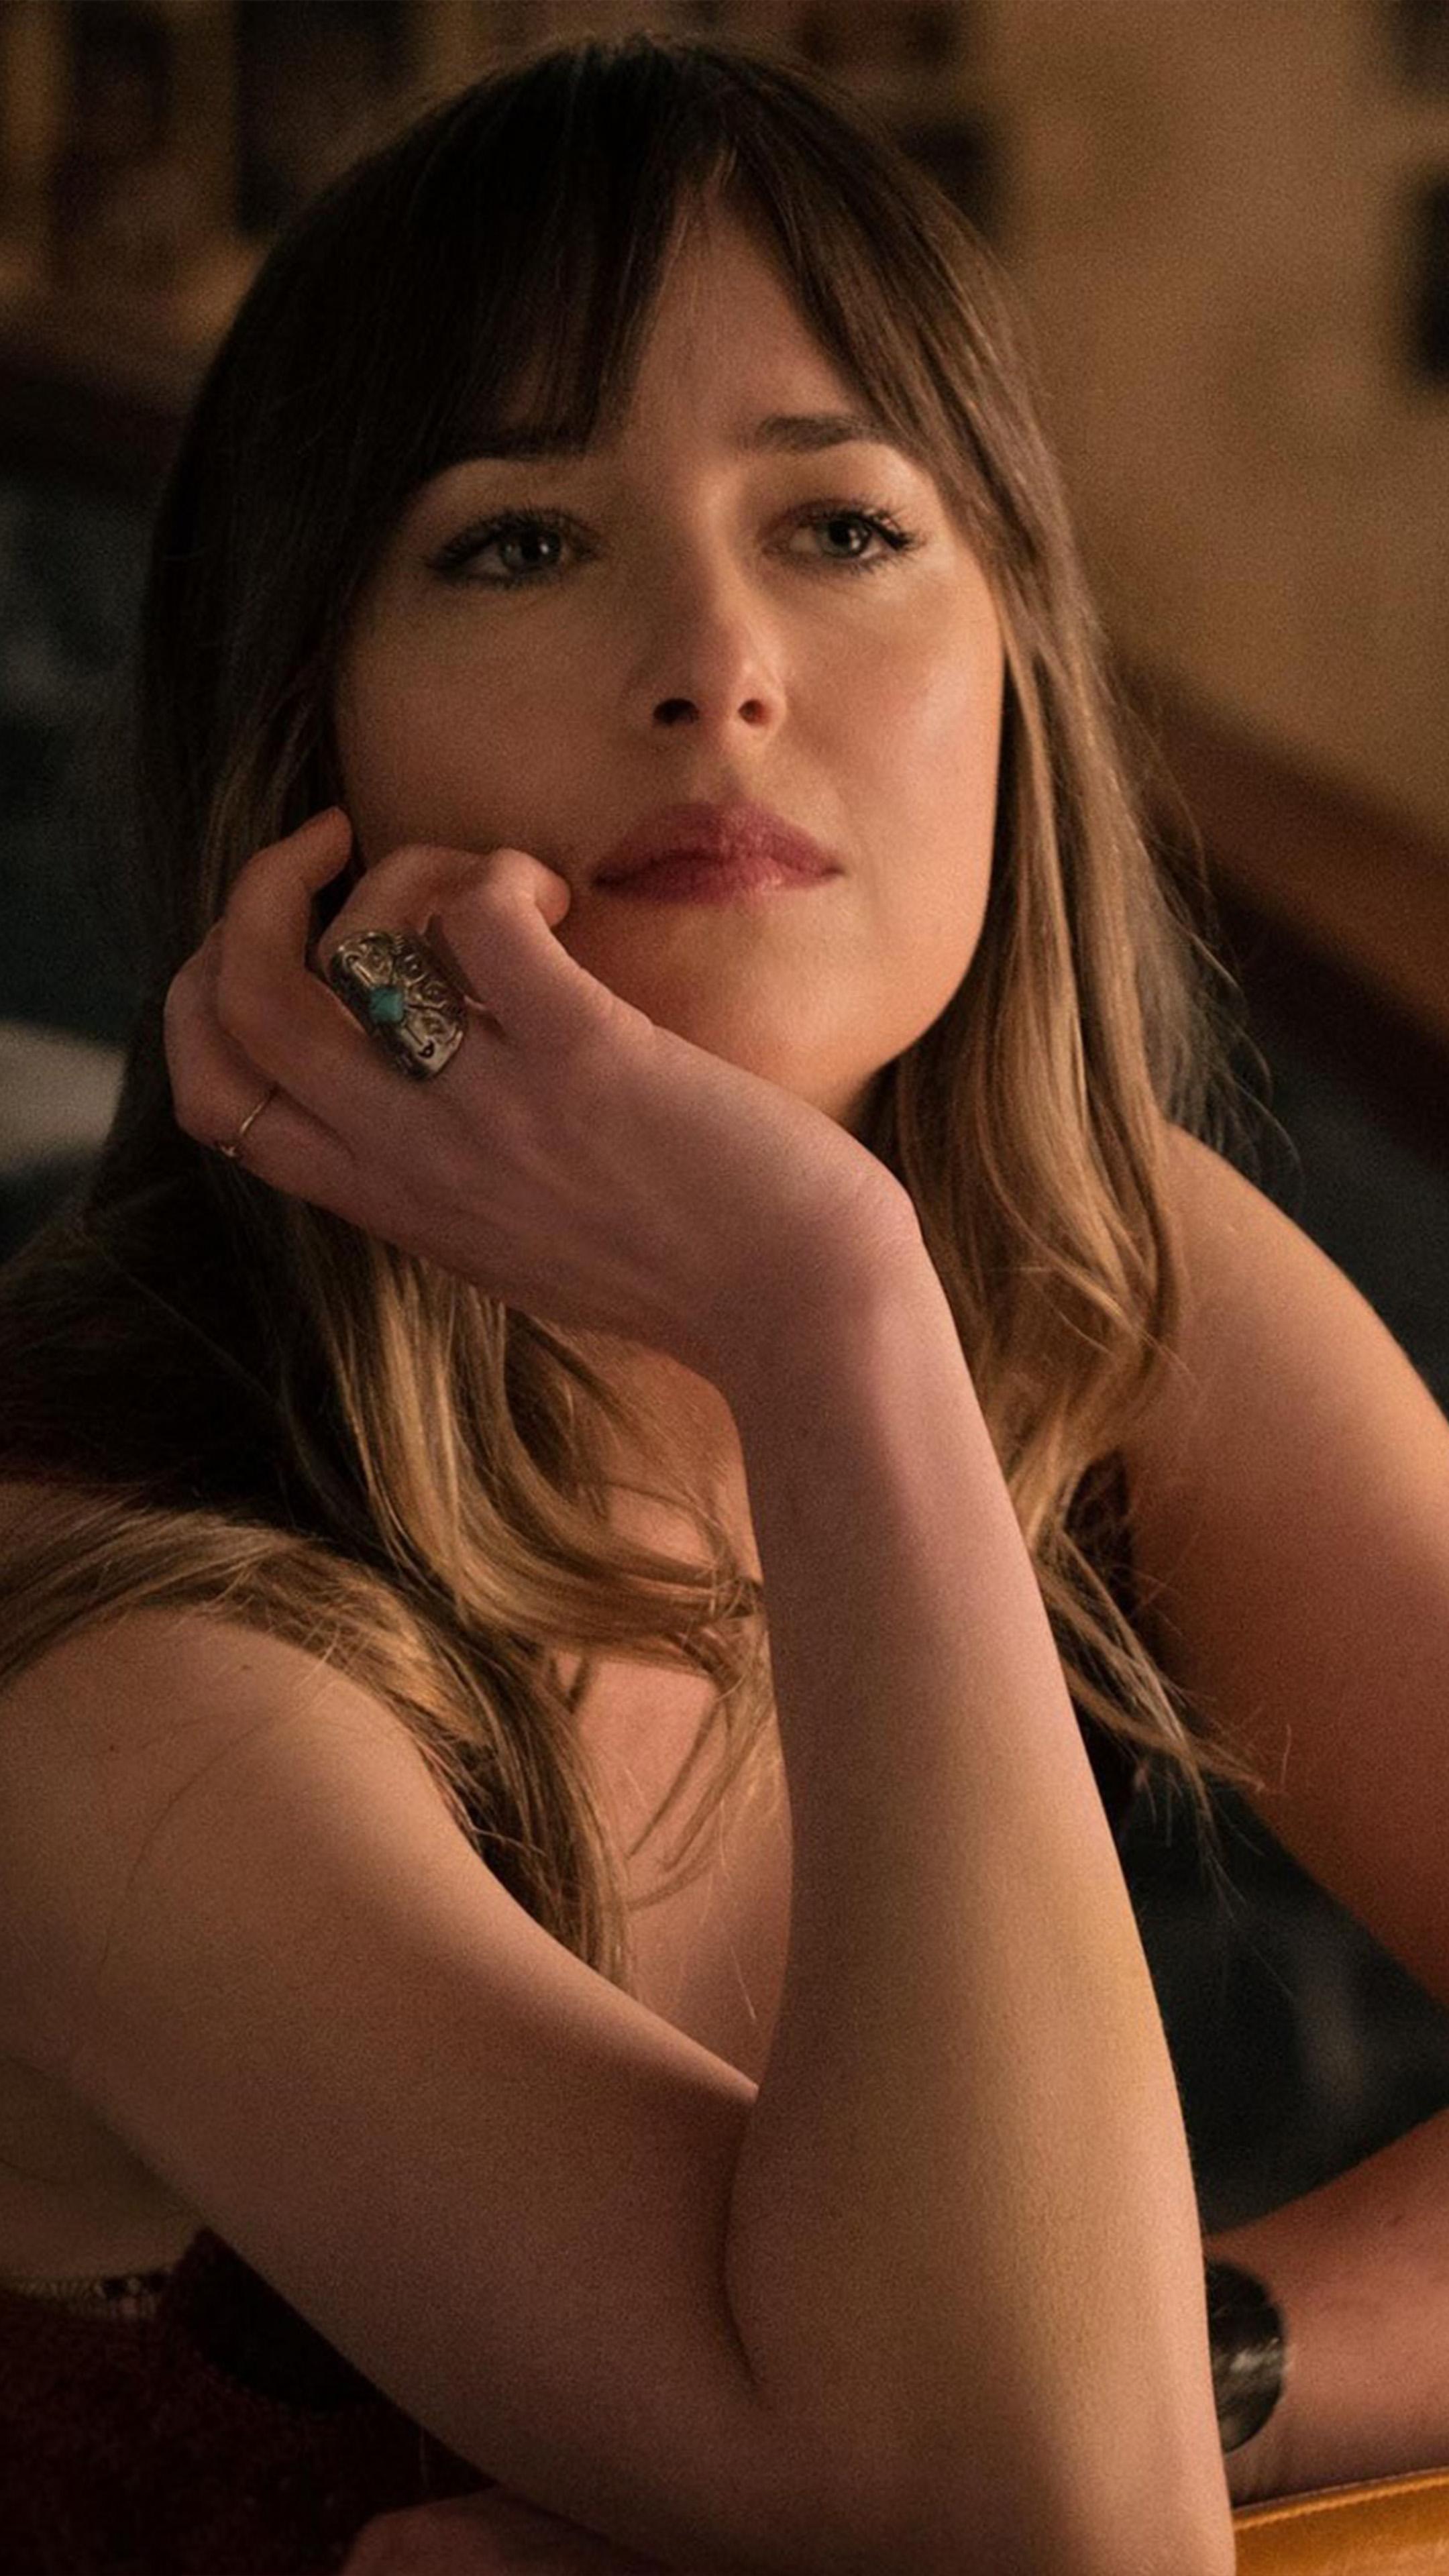 Dakota Johnson In Bad Times At The El Royale Movie Free 4k Ultra